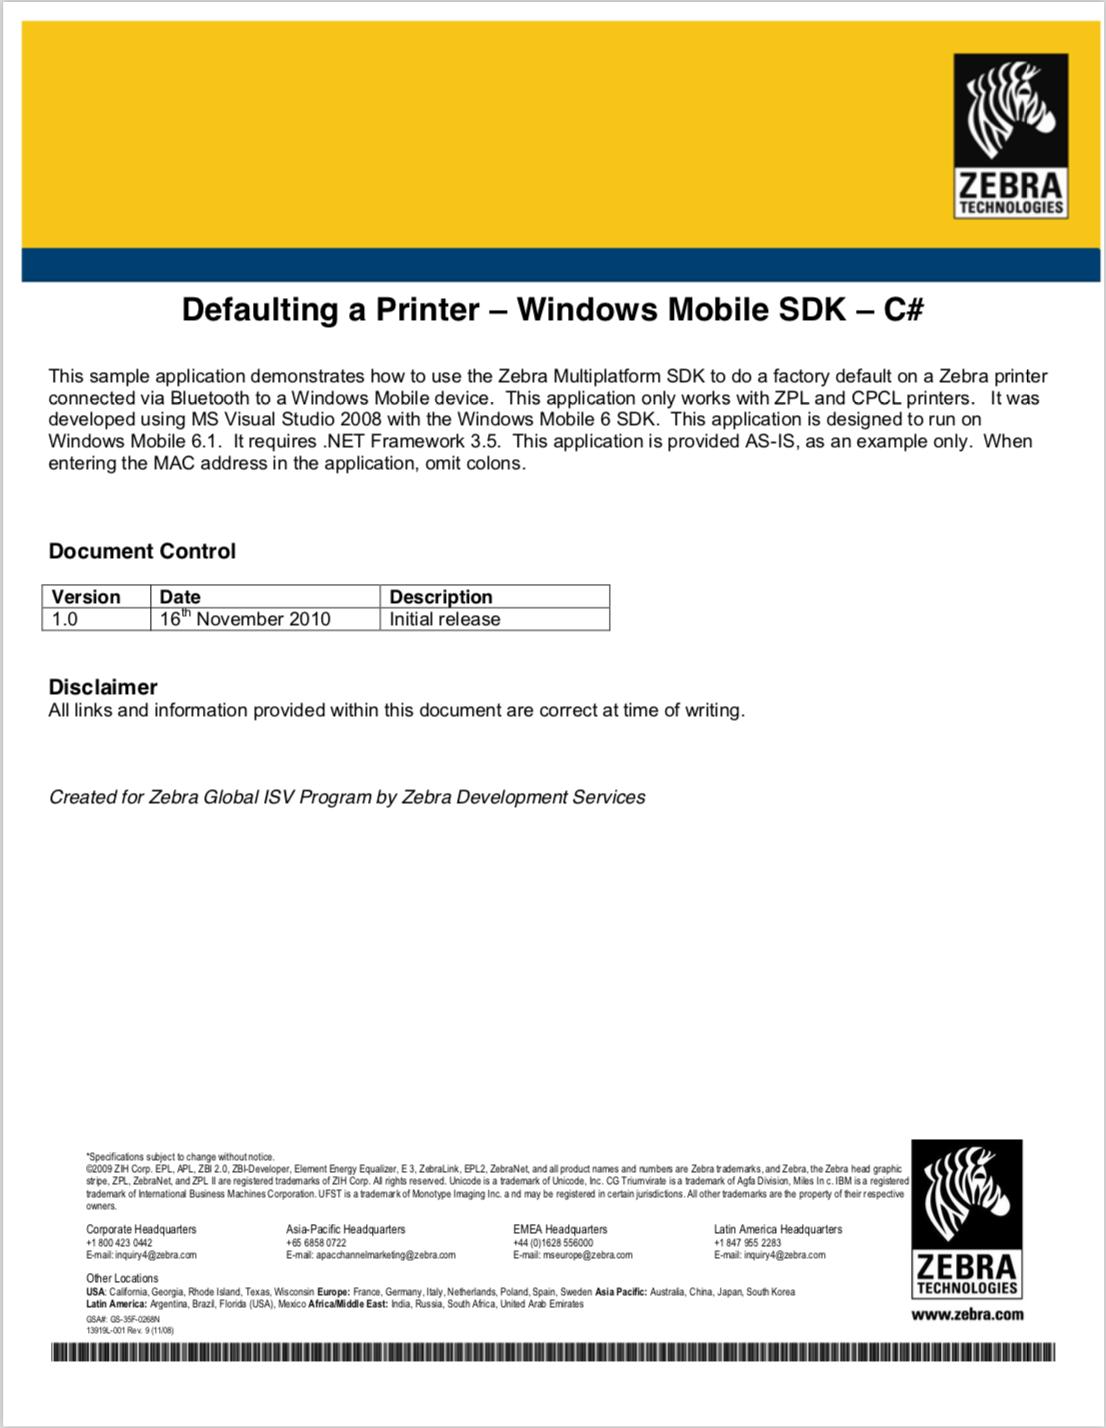 GitHub - ZebraISV/LinkOS-WindowsMobileCE-Samples-PrinterDefaultDemo